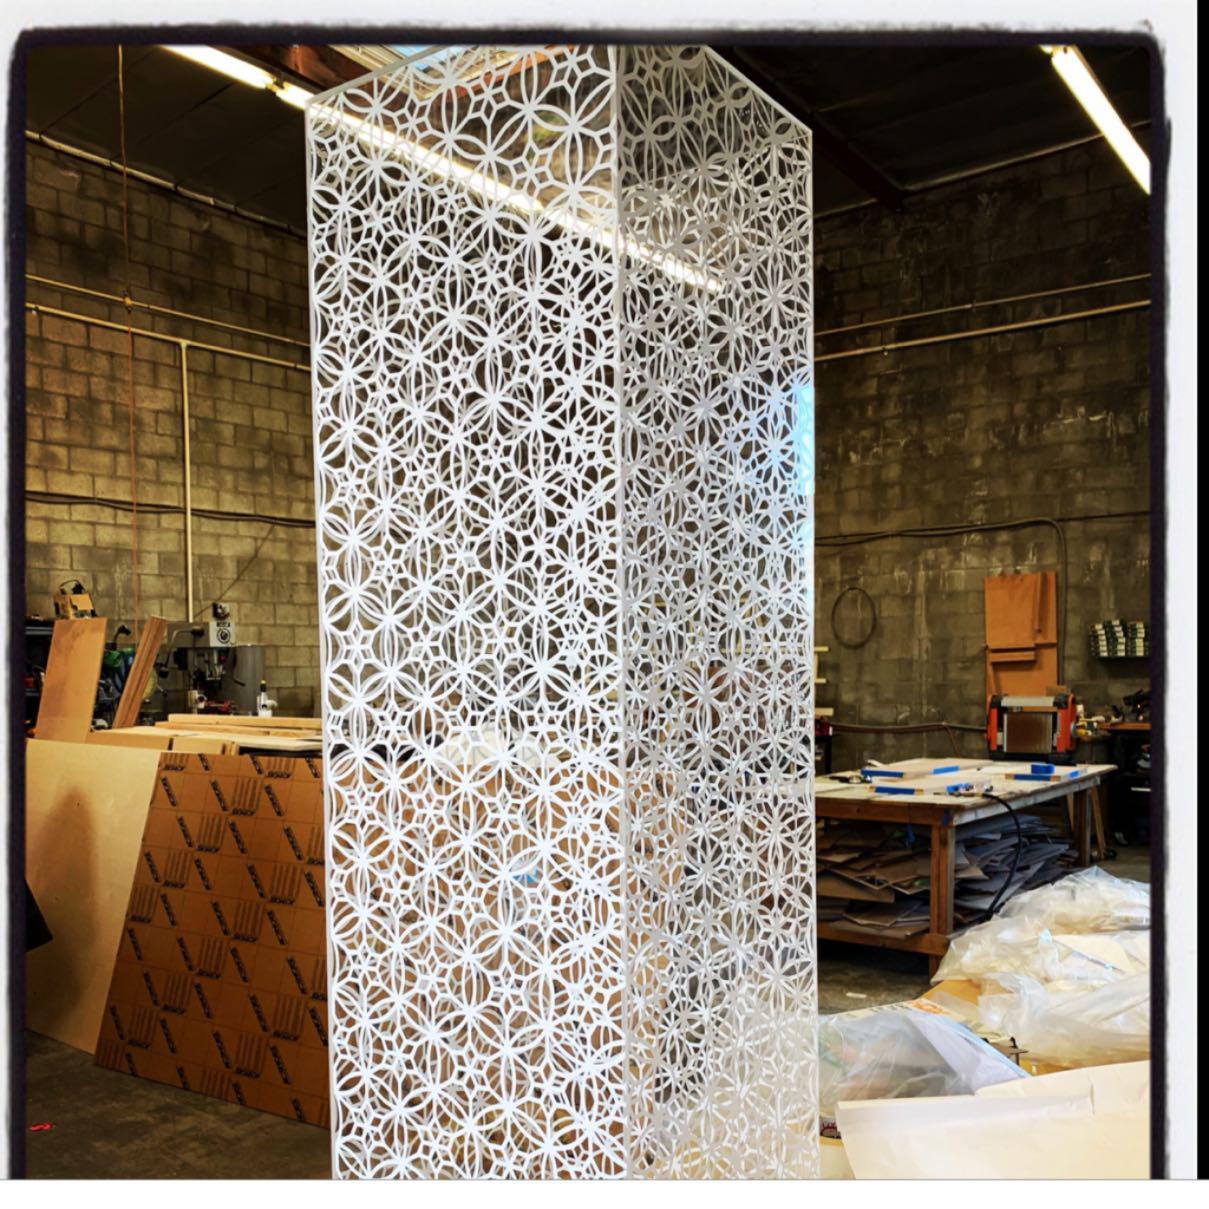 Graphic Spider / Custom Acrylic Fabrication image 14